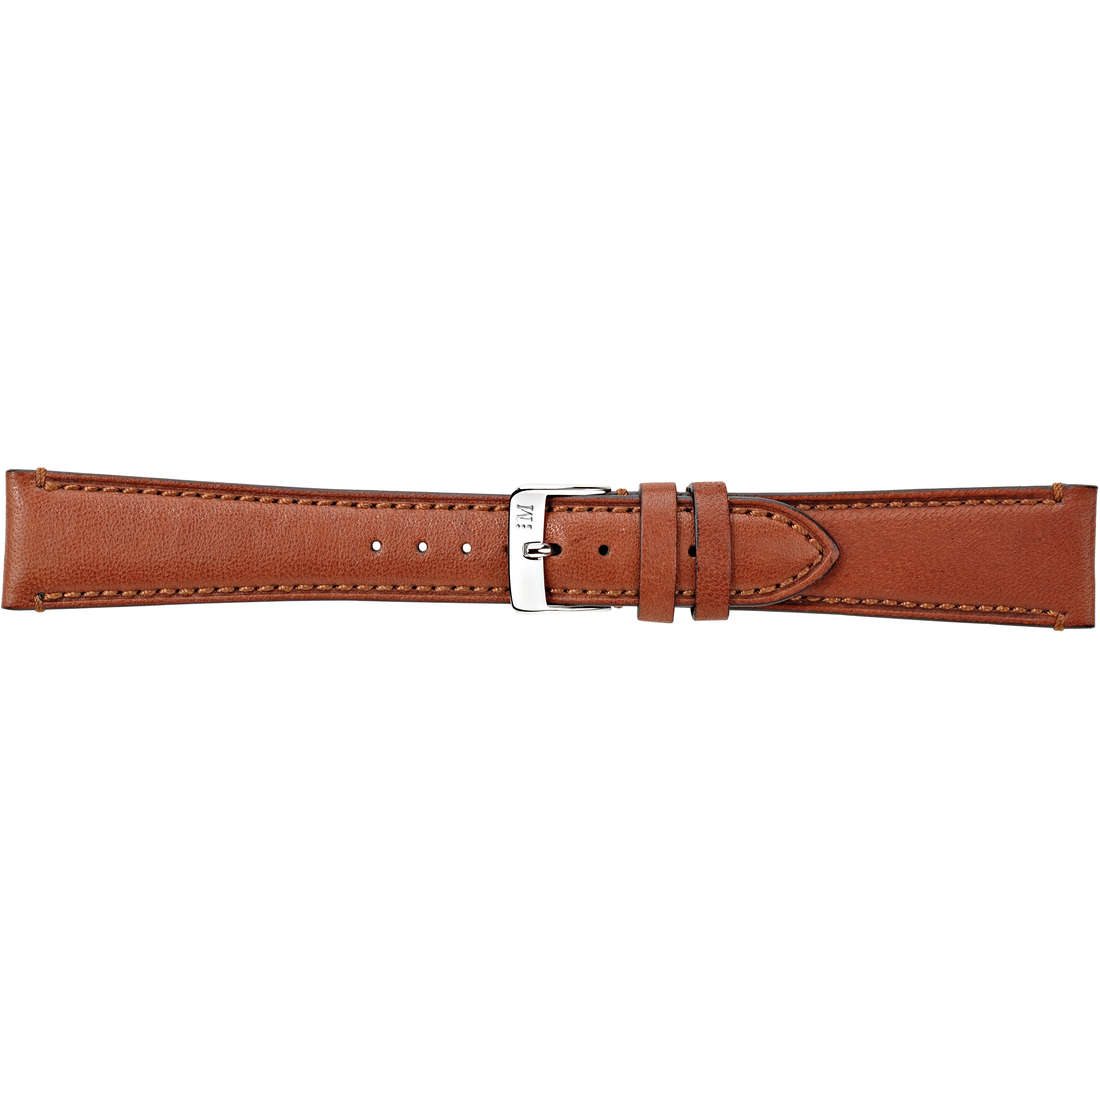 watch watch bands watch straps man Morellato Manufatti A01X3495006041CR18